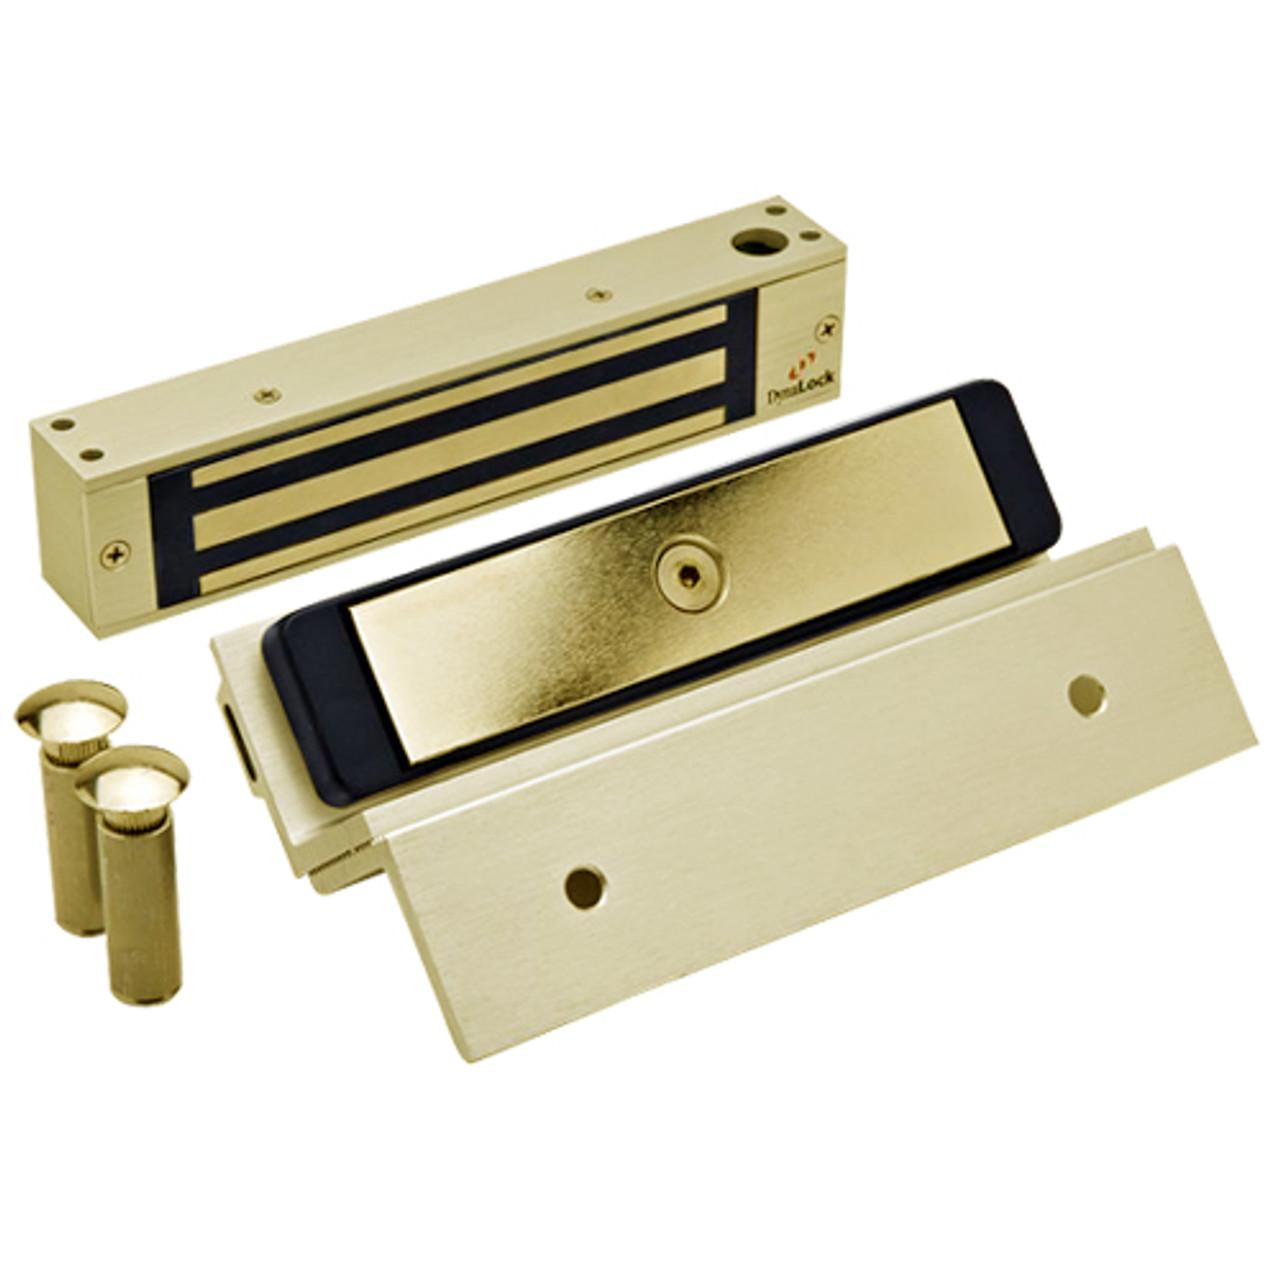 2585-TJ85-US3 DynaLock 2500 Series 650 LB Single Bantam Mini Electromagnetic Lock for Inswing Door in Bright Brass